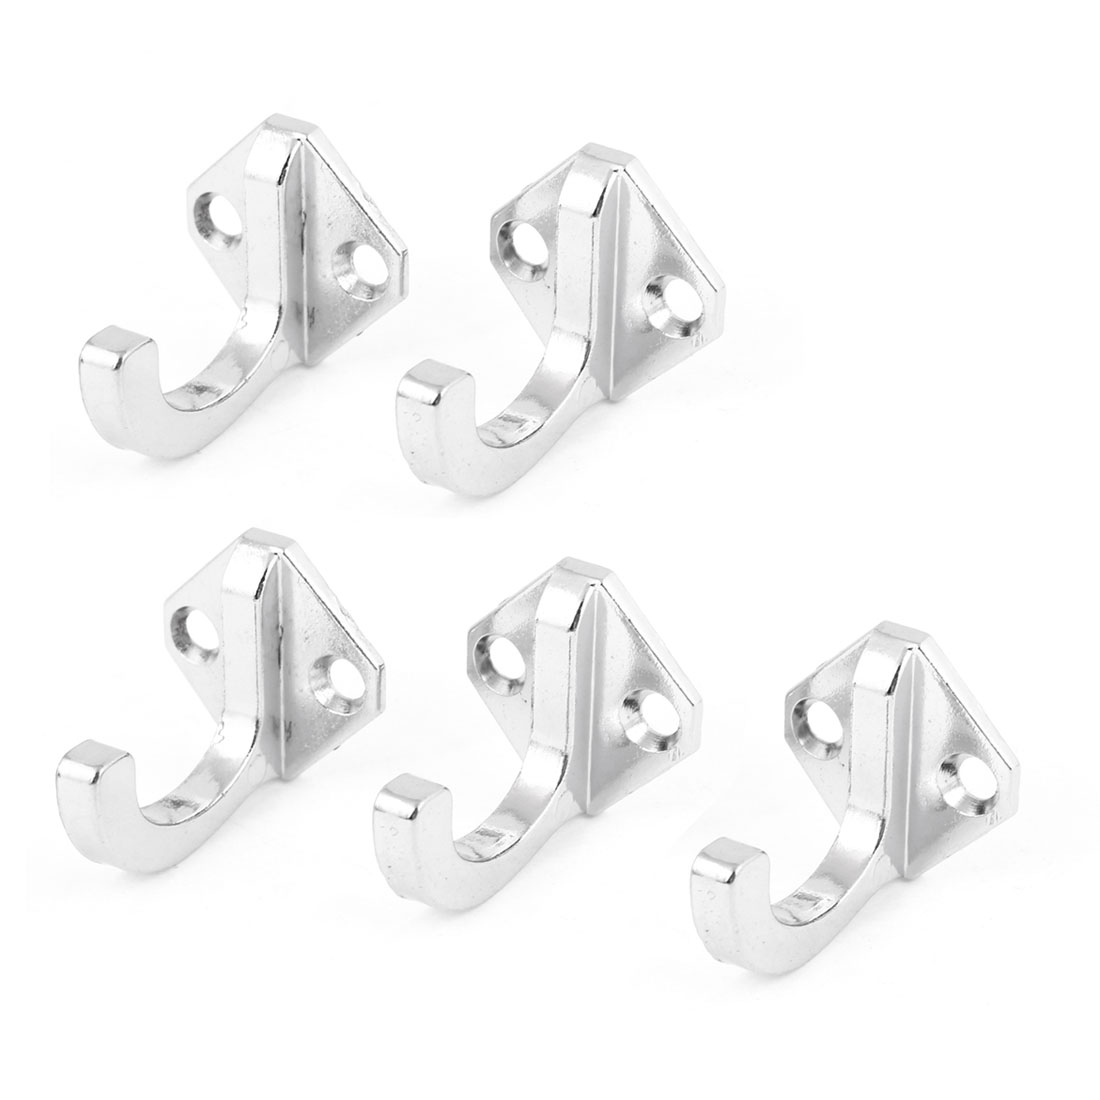 5Pcs Silver Tone Alloy Screw Mounting Scarf Towel Single Hanger Wall Hook